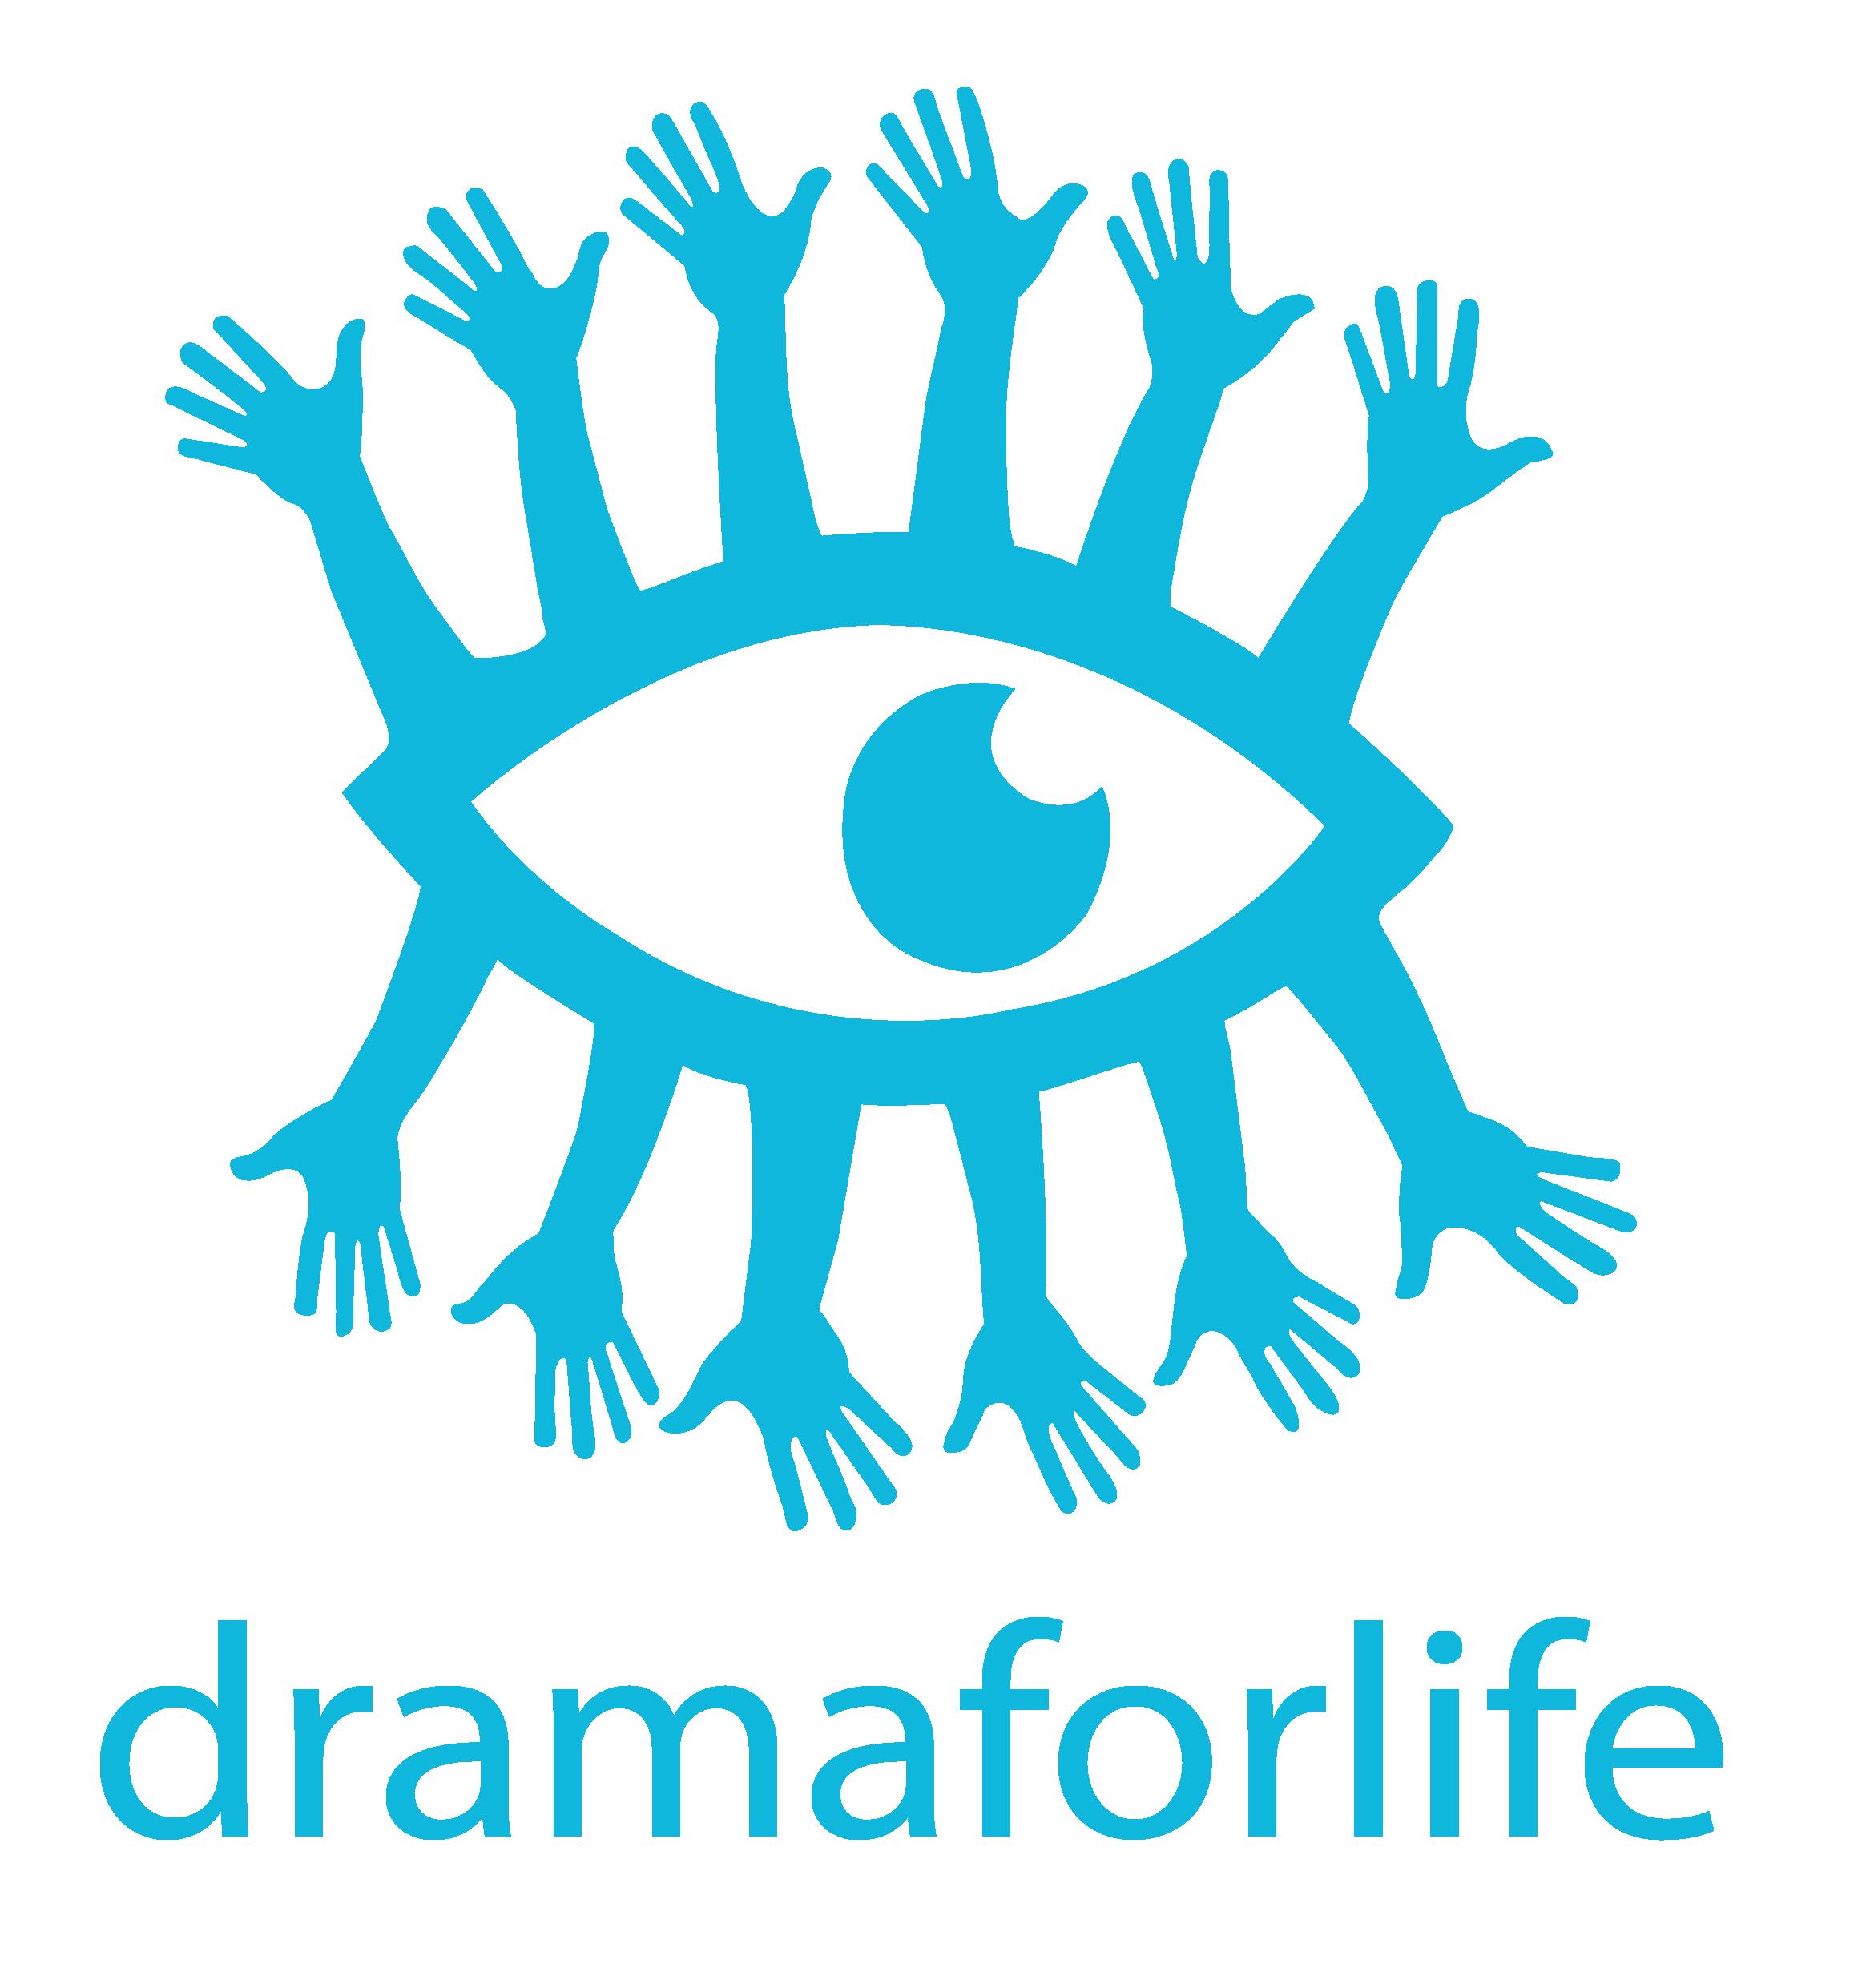 Visit drama for life's web